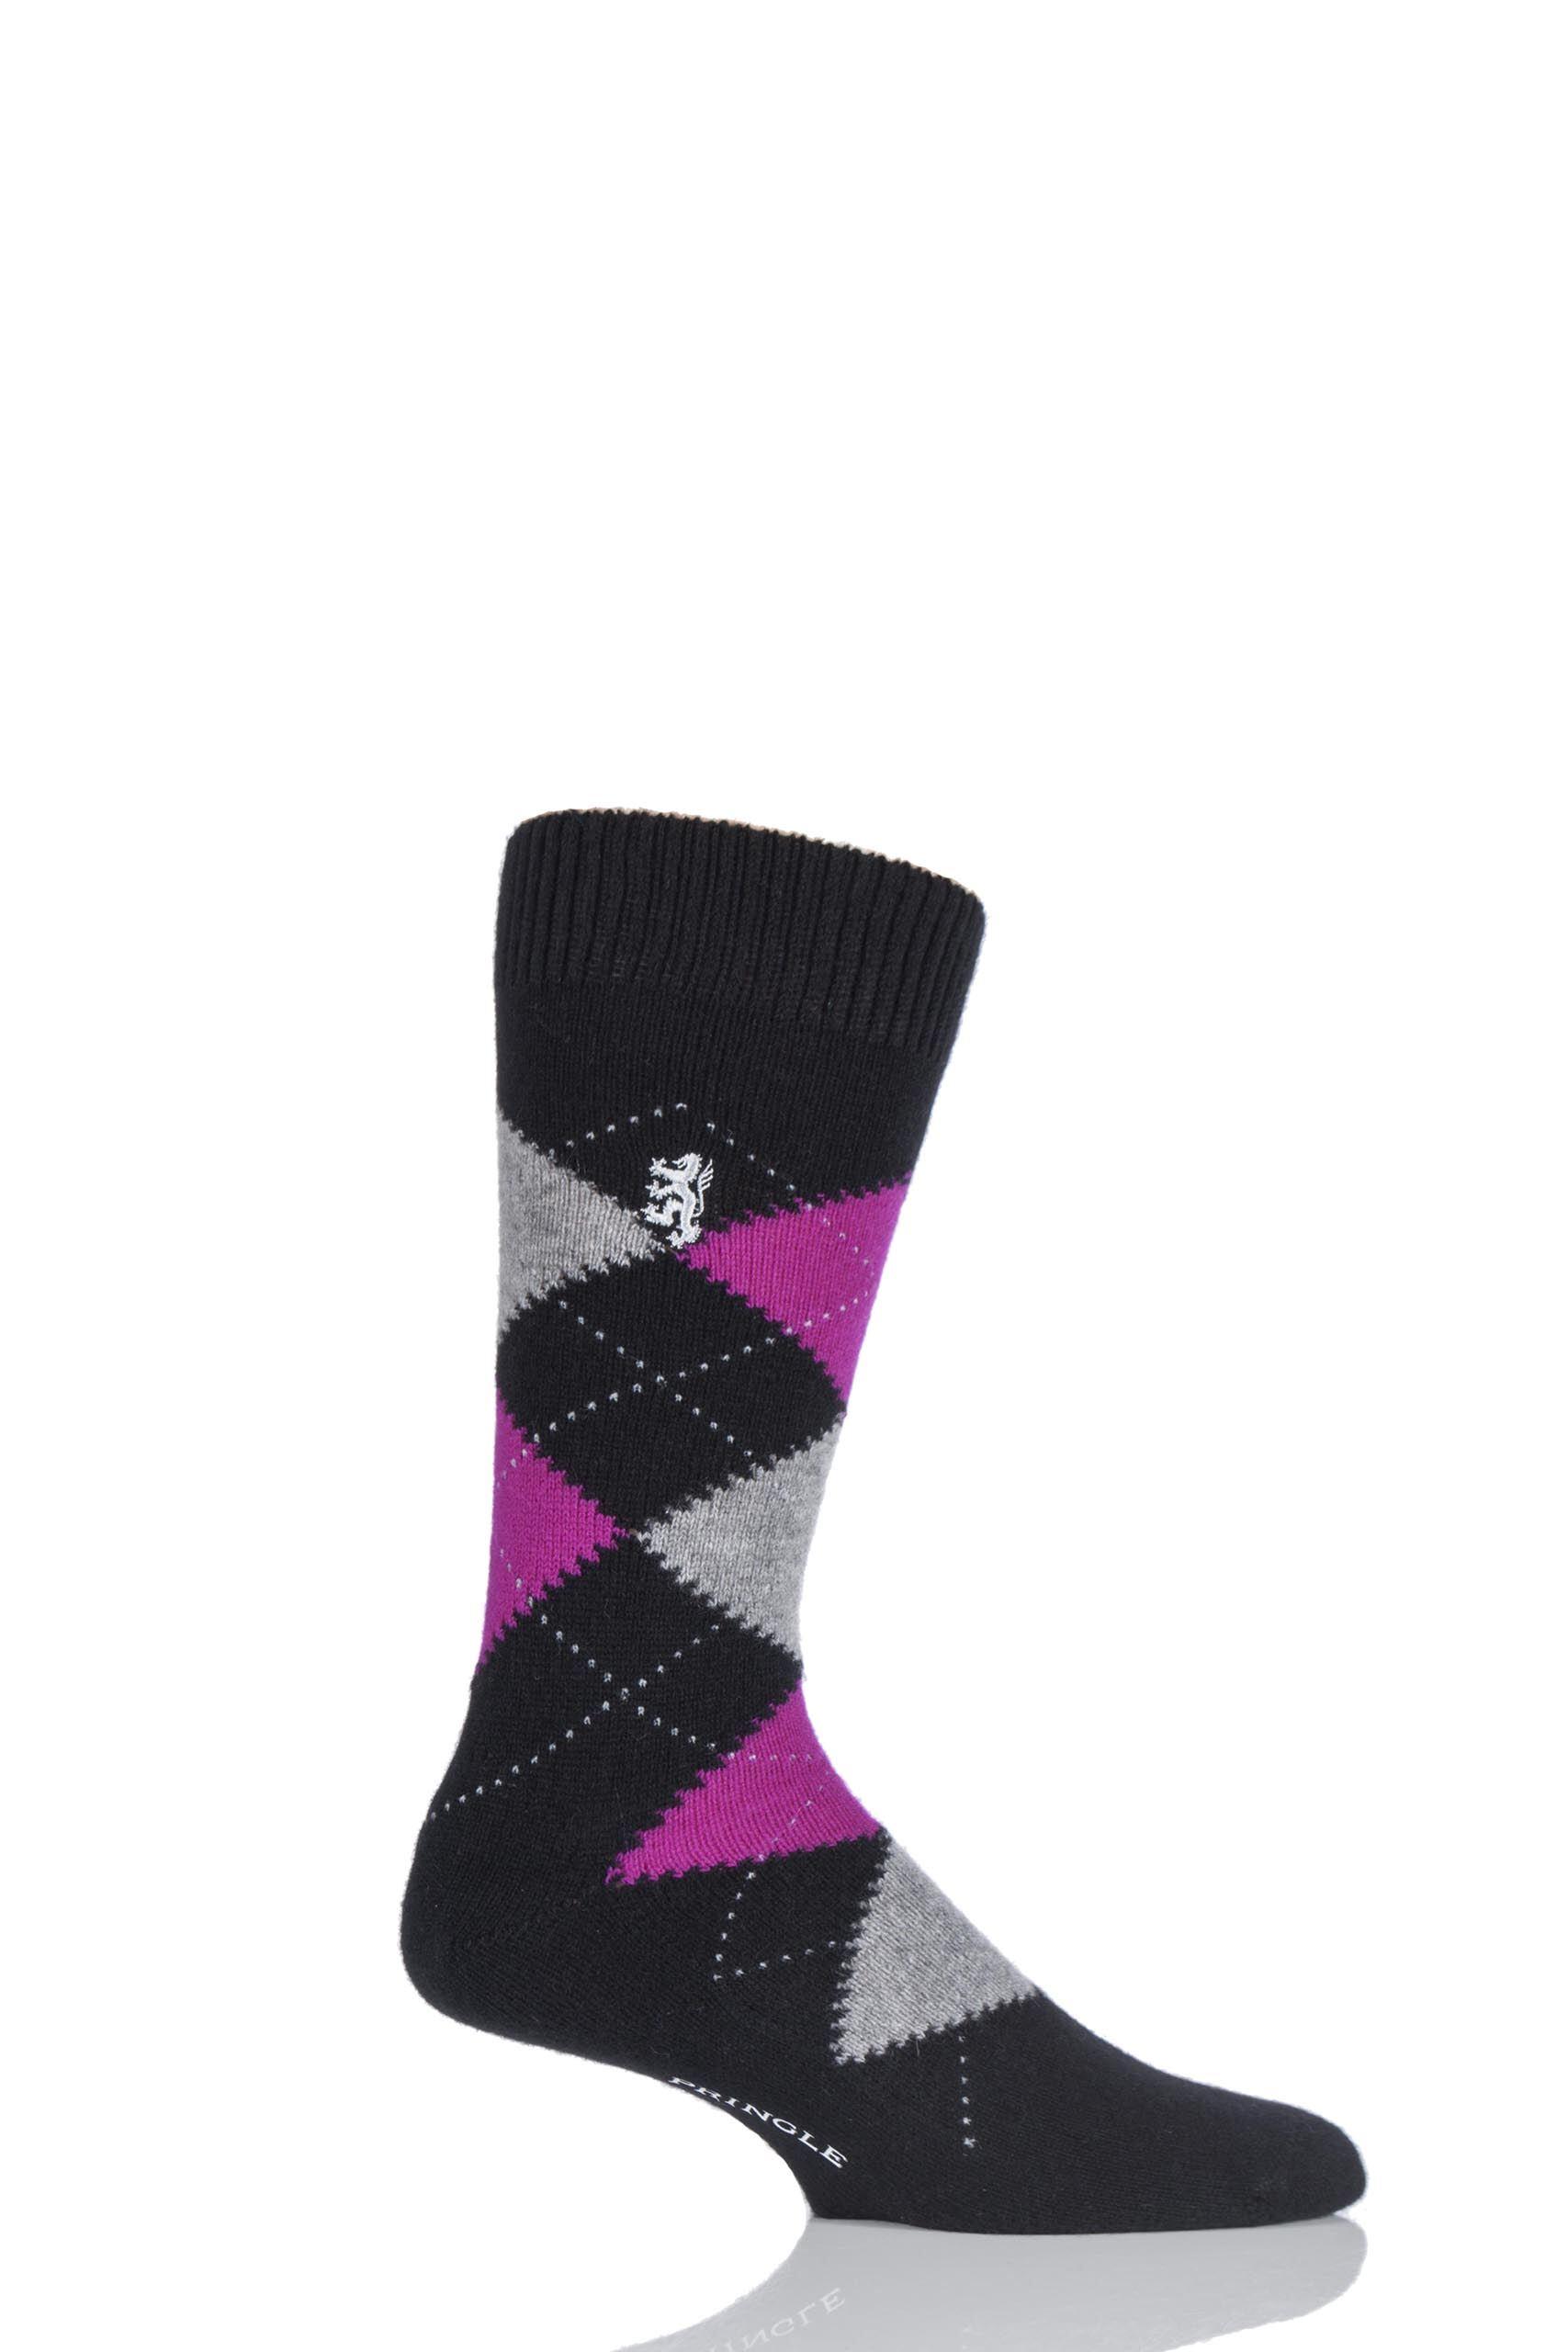 Image of 1 Pair Black 85% Cashmere Argyle Socks Men's 9-11 Mens - Pringle of Scotland